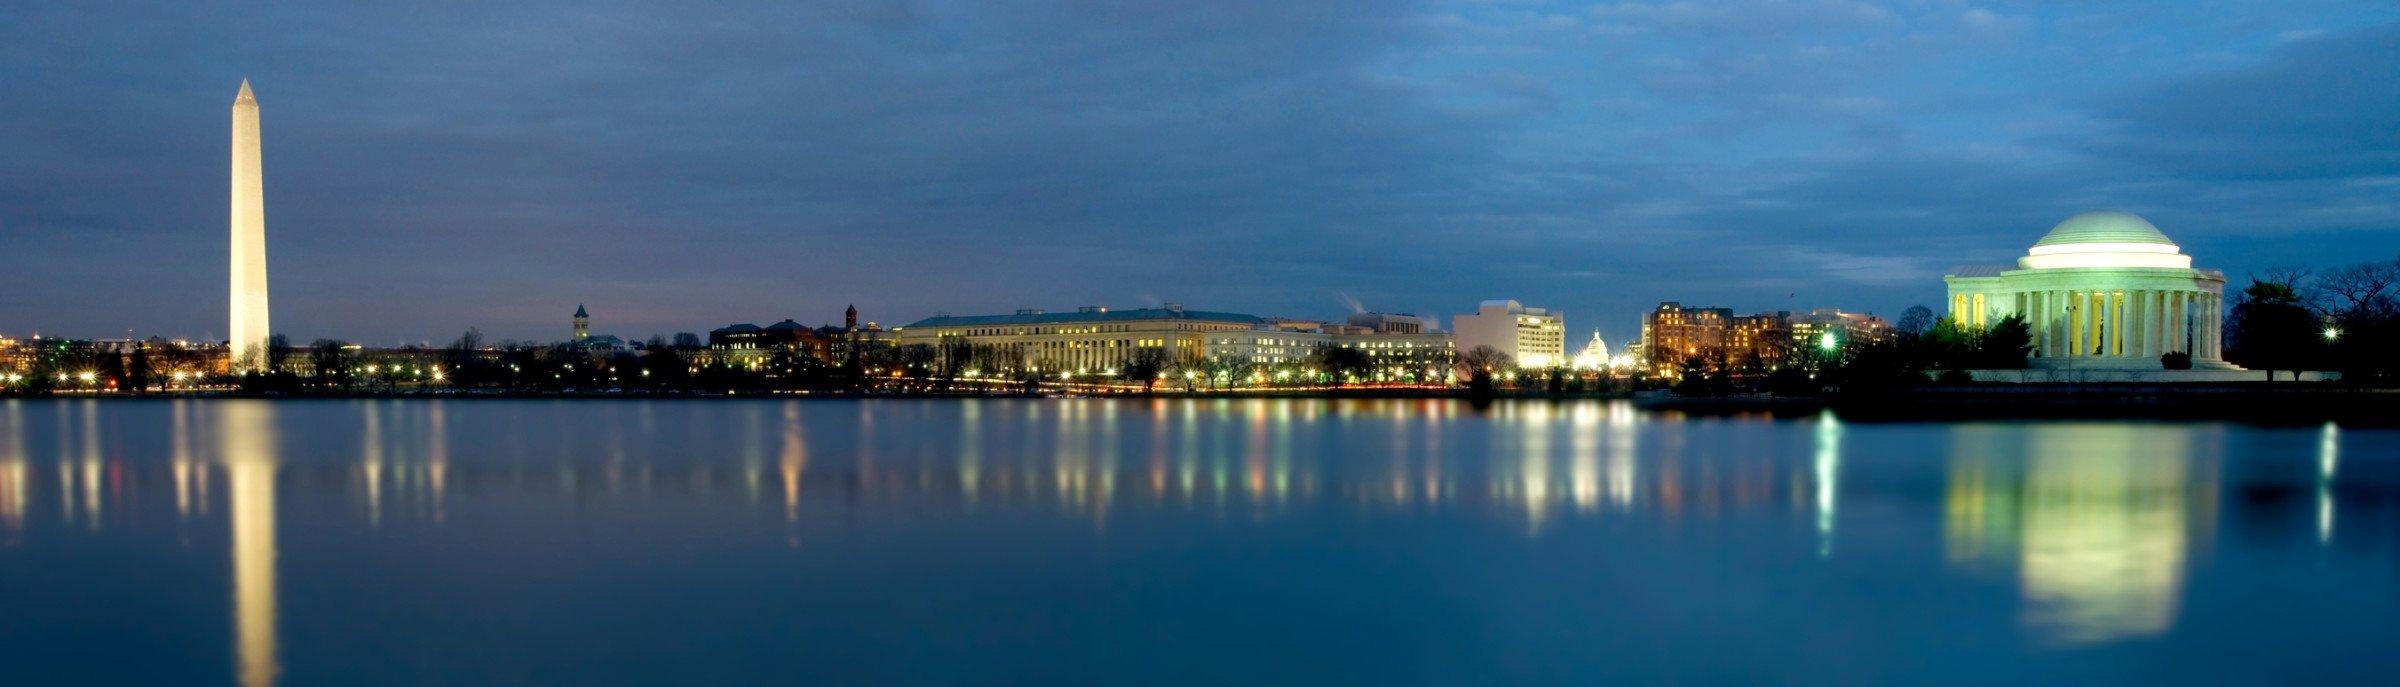 Washington, DC Foreclosure Auctions